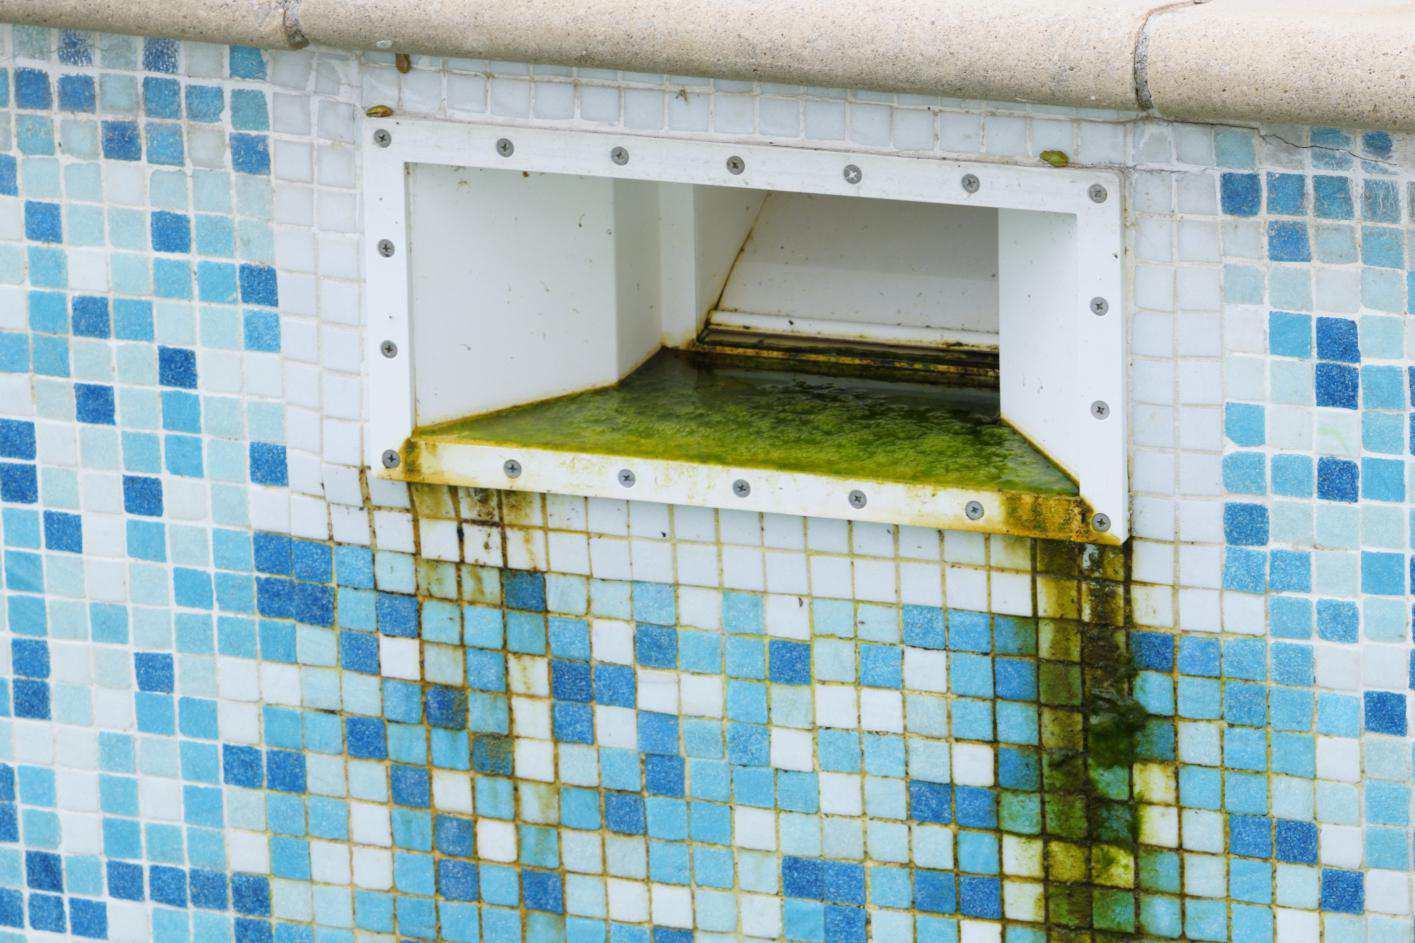 Green Algae Grunge before Cleaning Tiled Swimming Pool